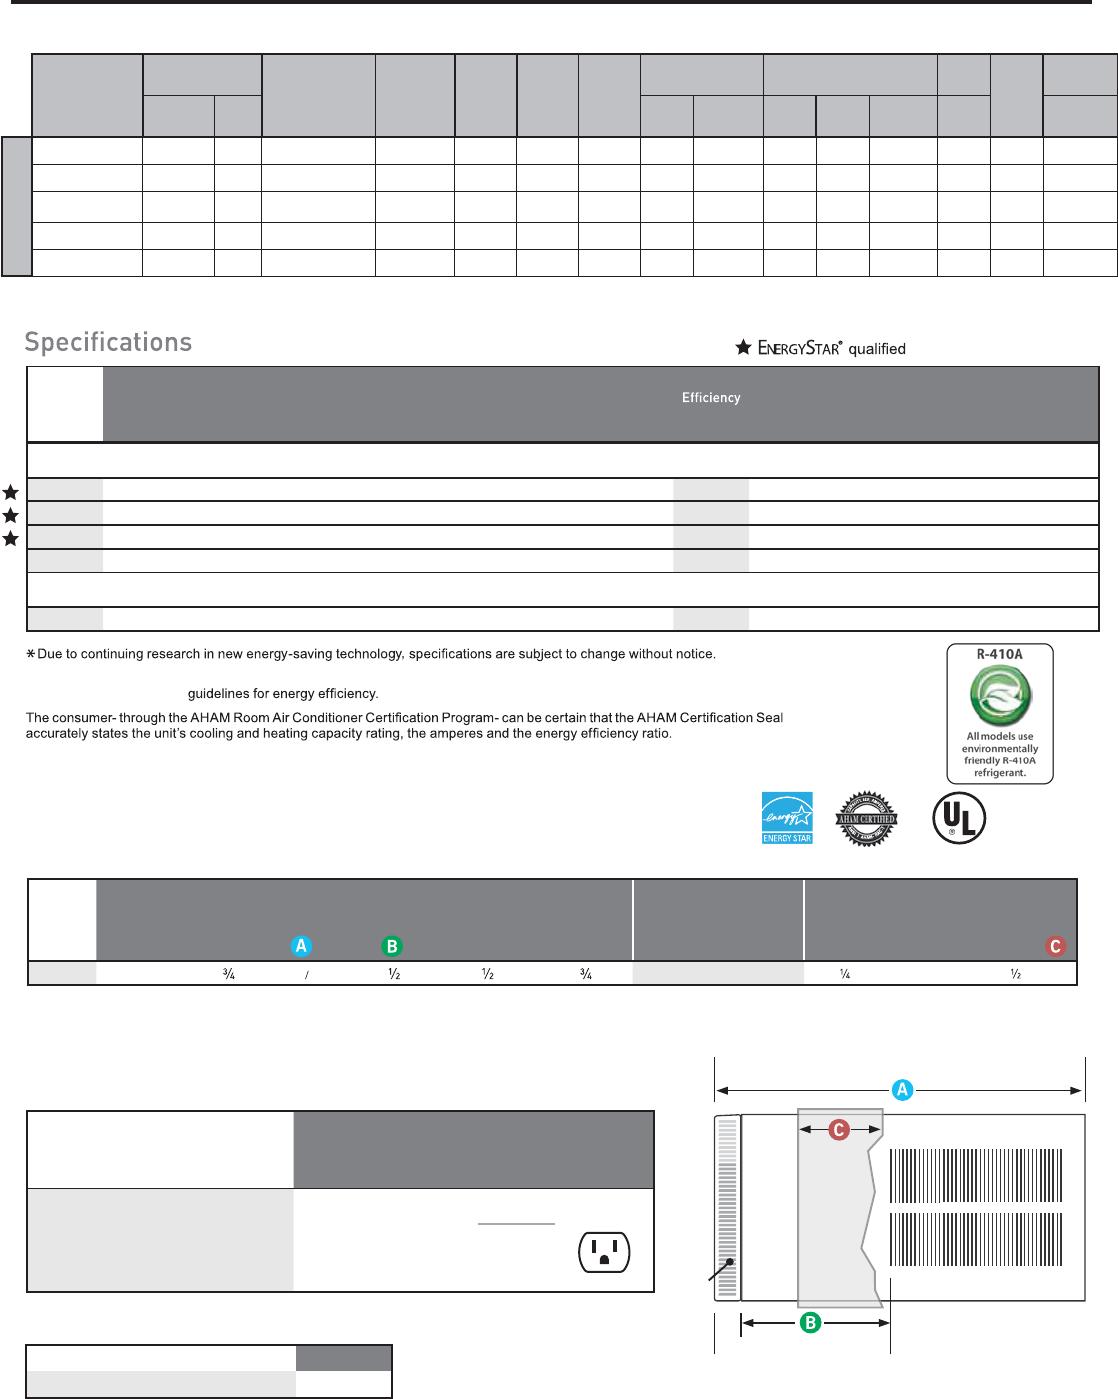 Friedrich Eq08n11 Sq05n10 Sq06n10 Sq08n10 Sq10n10 Window Unit Wiring Diagram Performance Data Installation